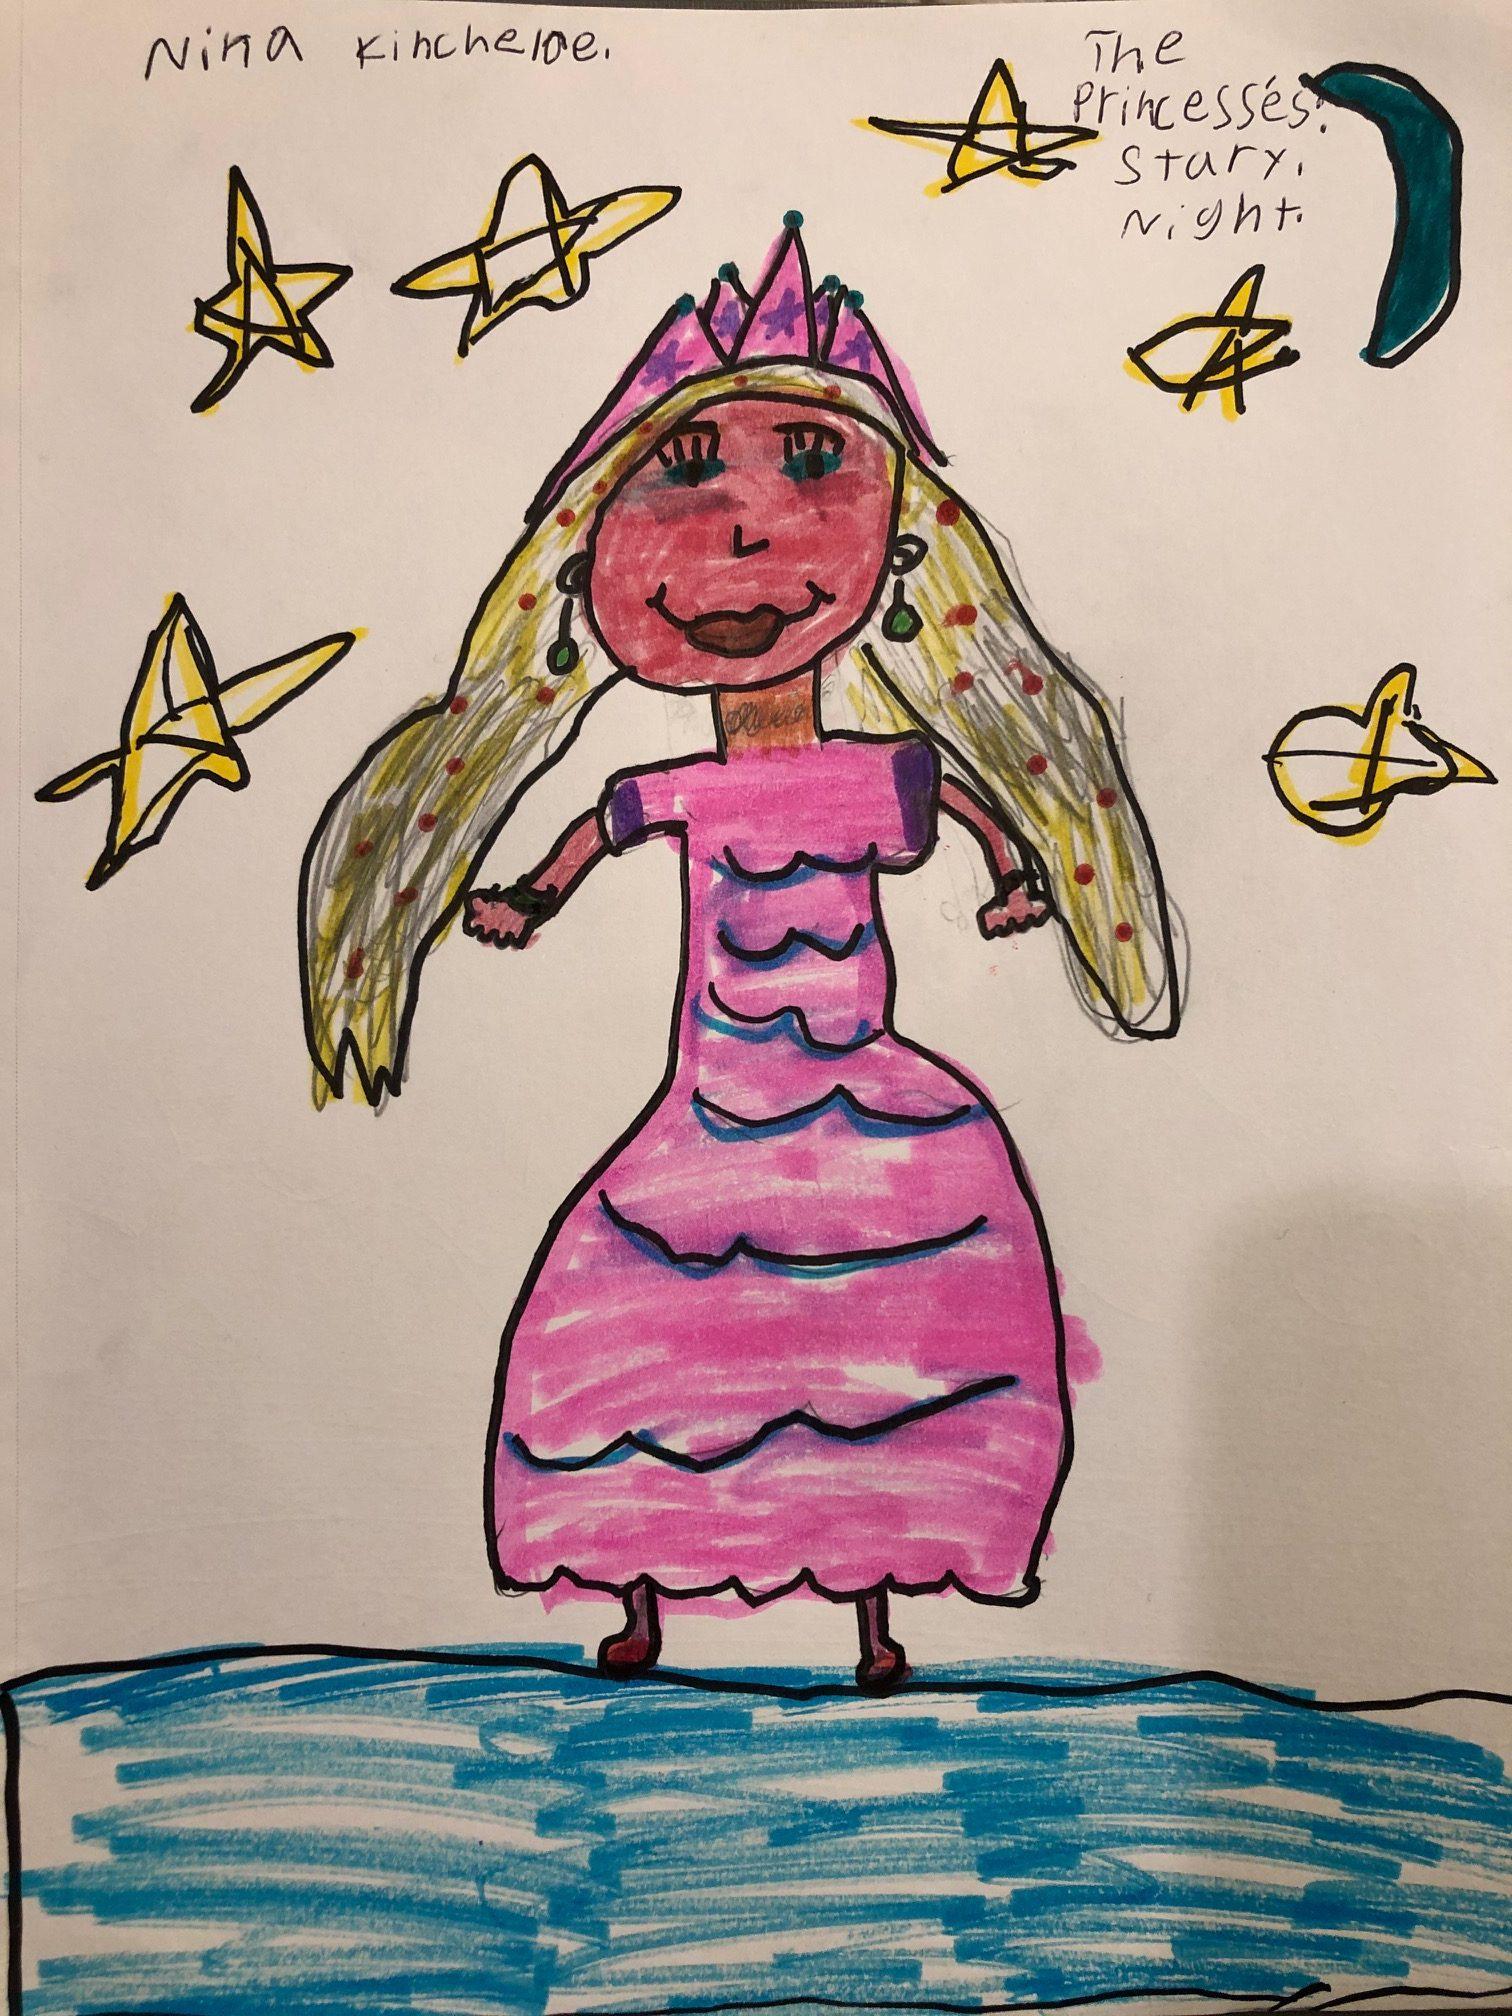 carnival princess starry night by nina kincheloe 2nd grade